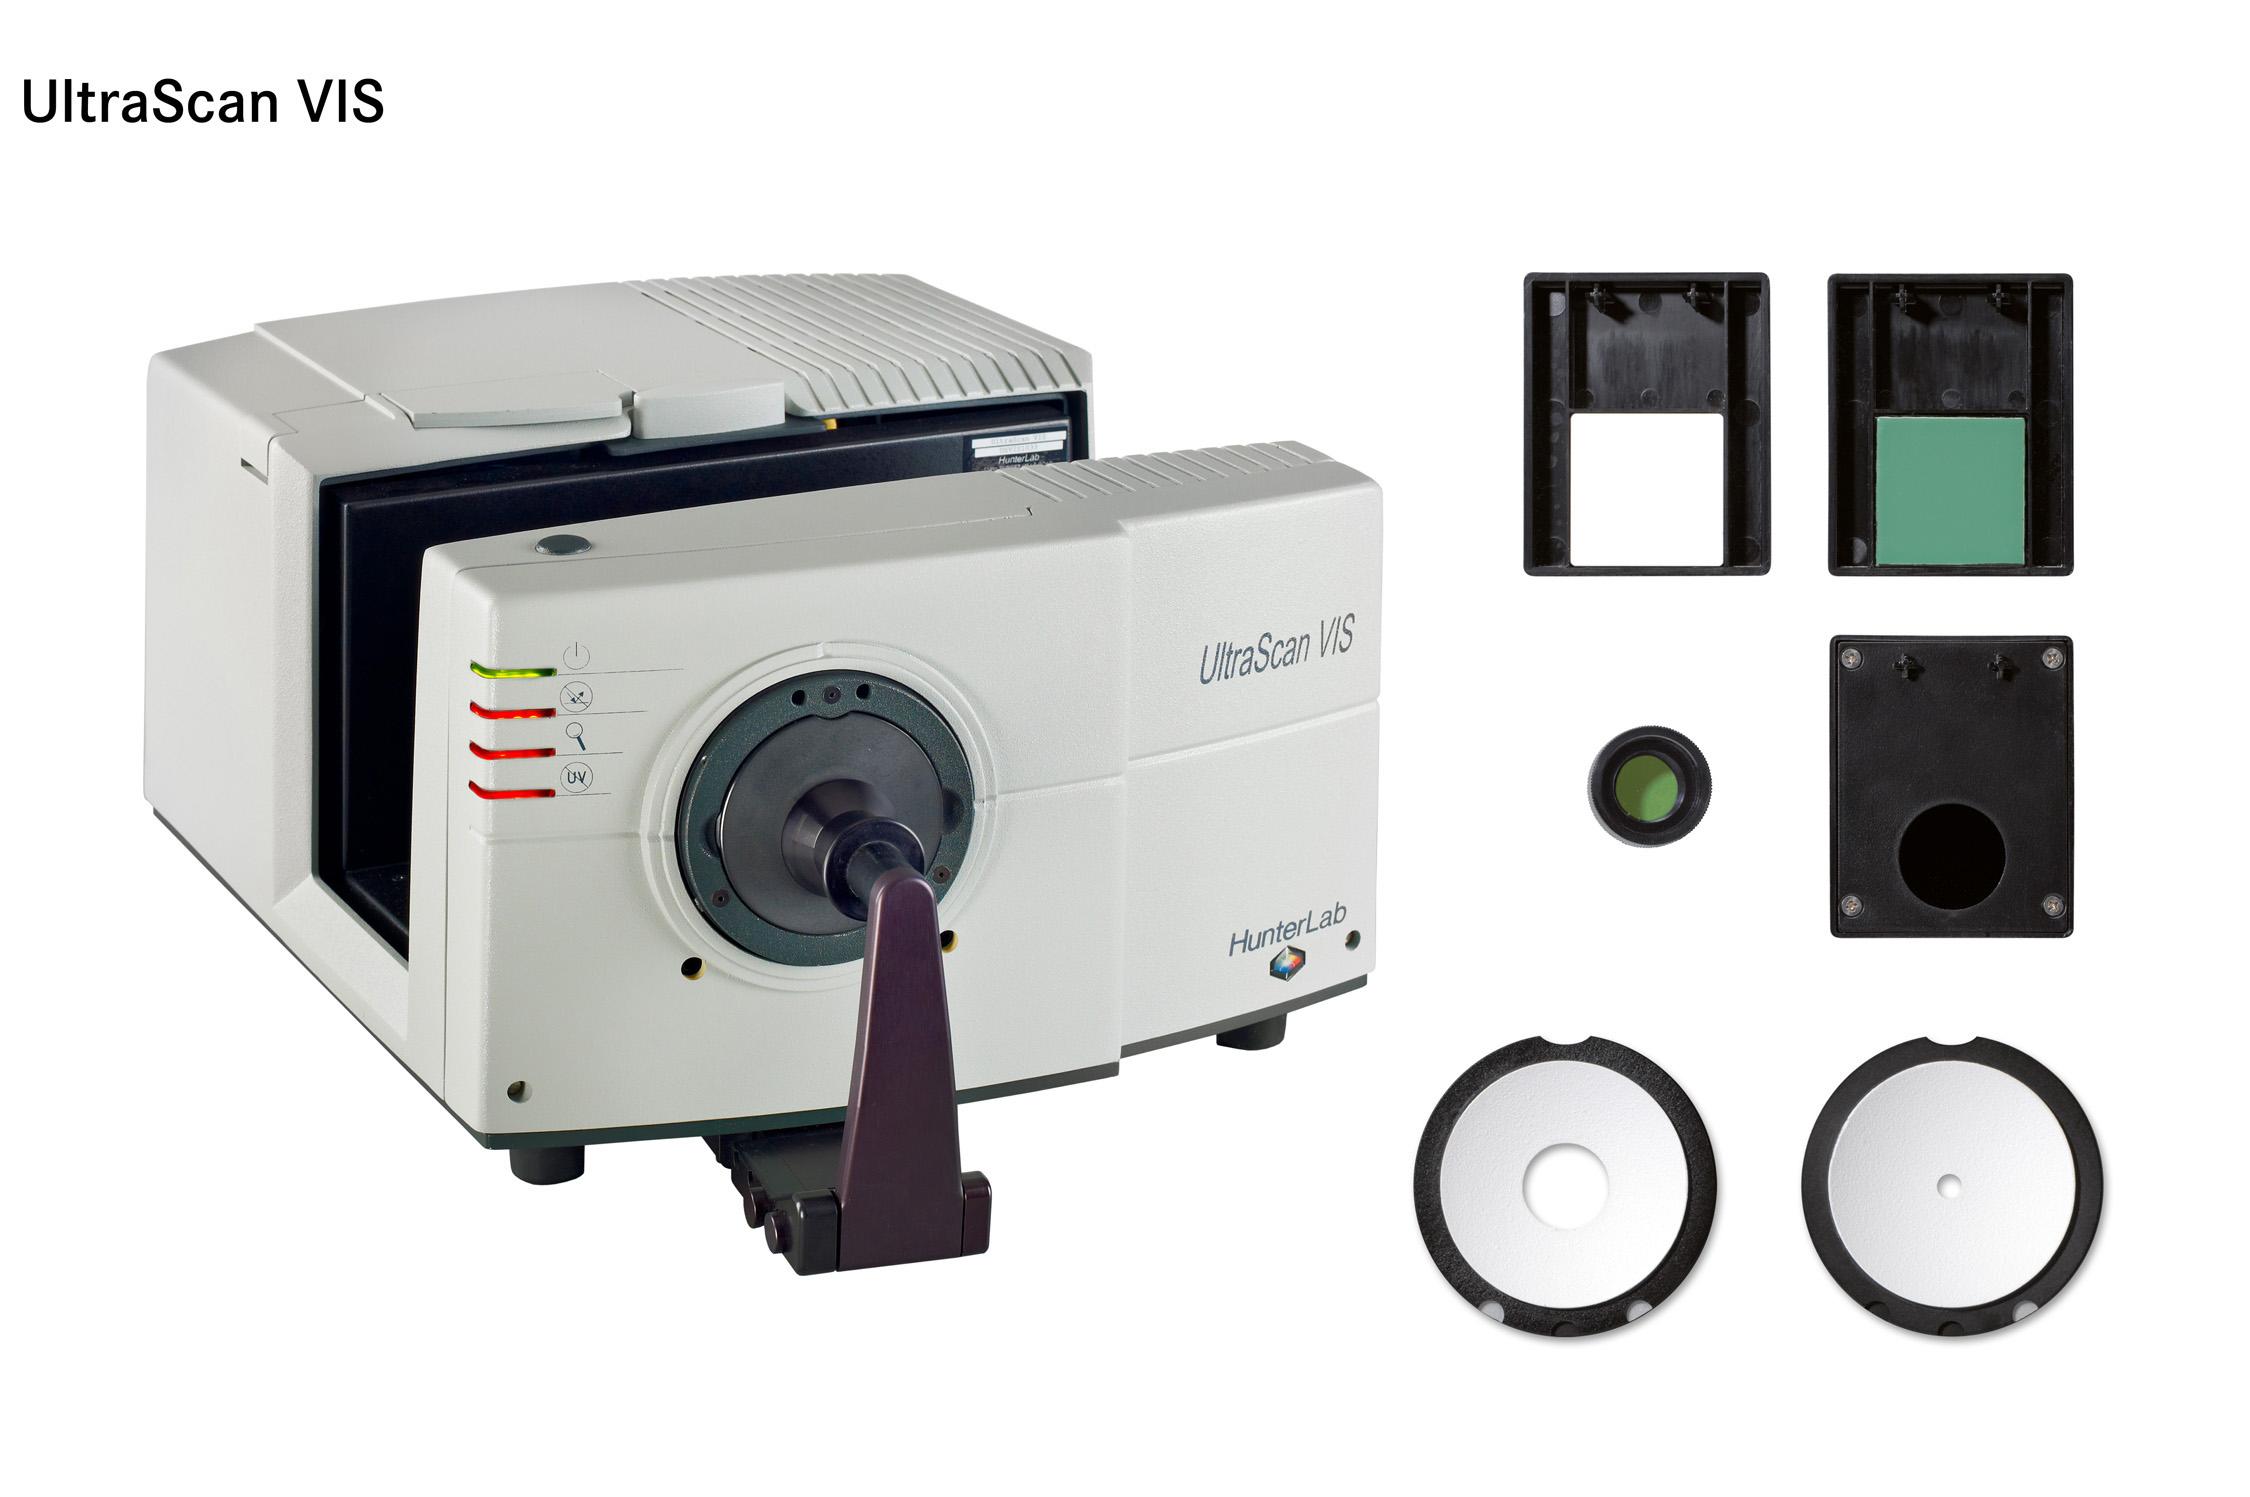 Spektrofotometr UltraScan Vis